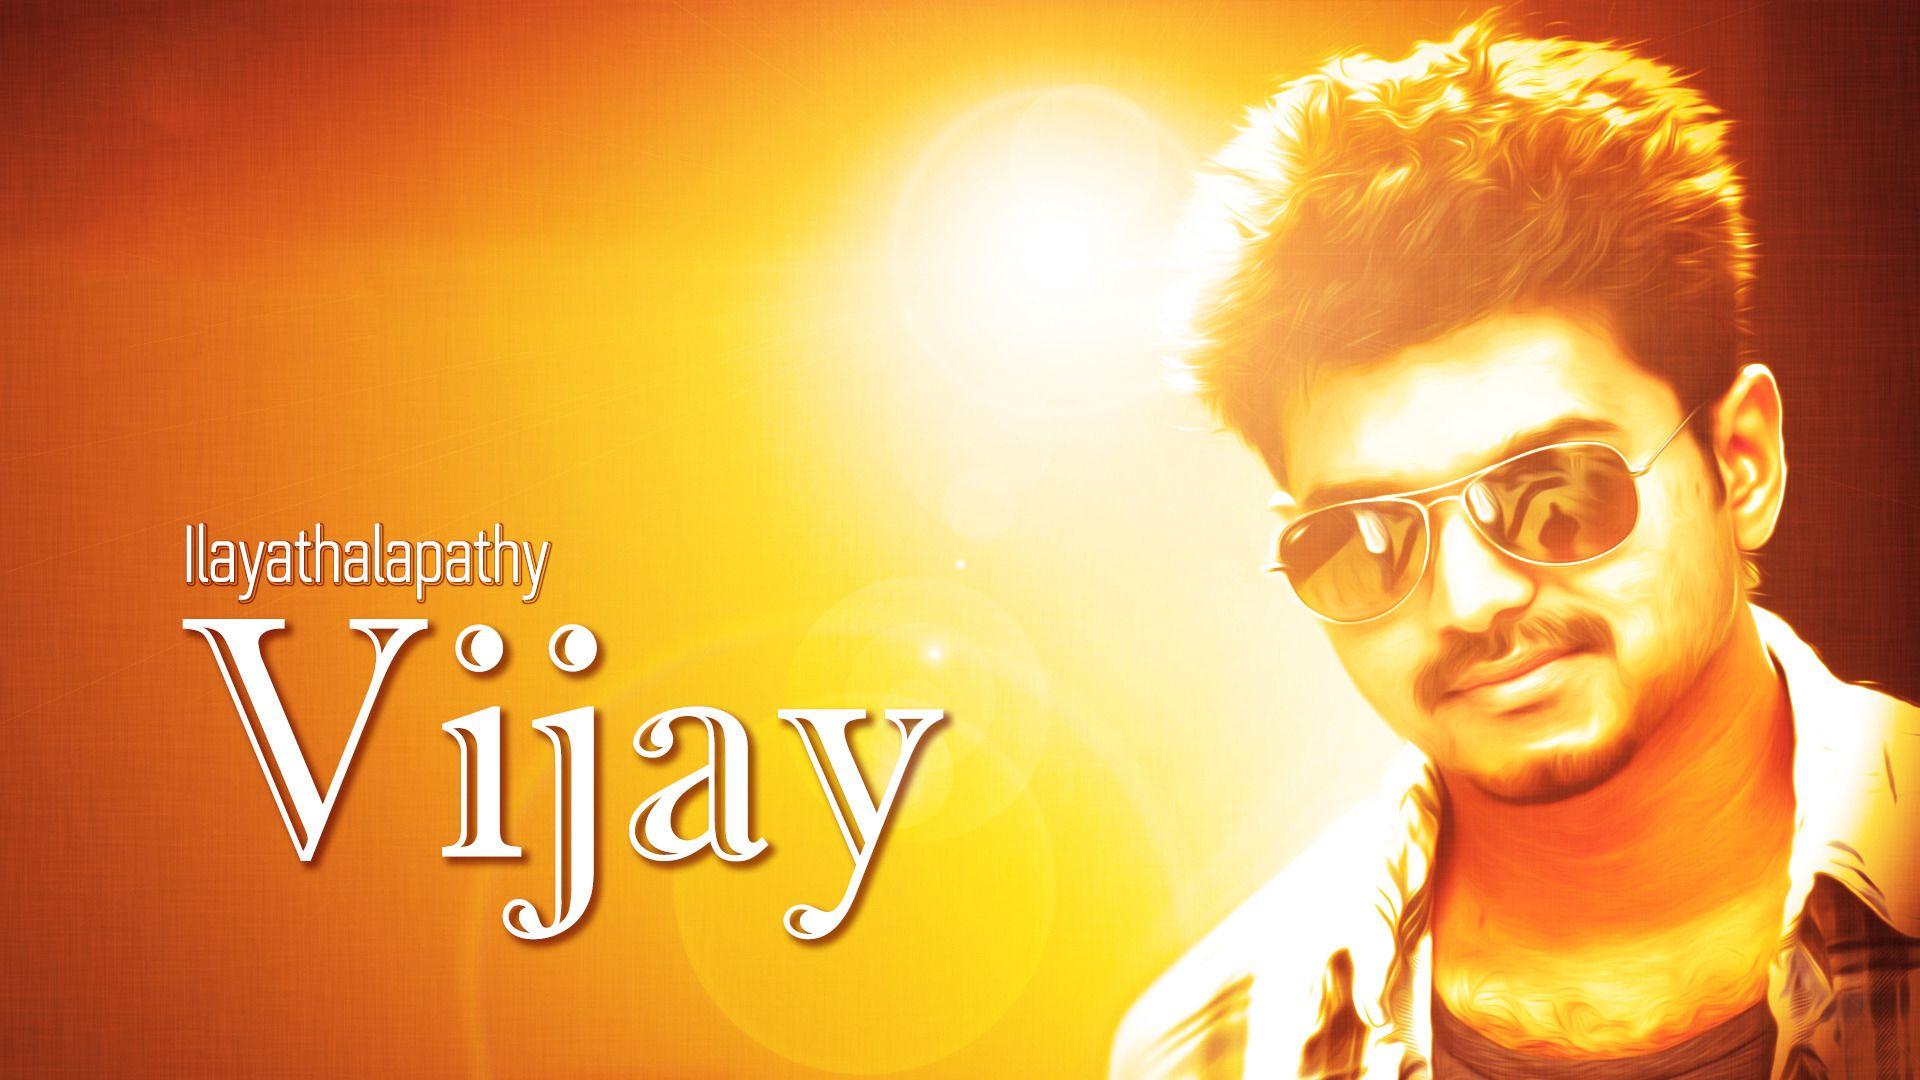 Vijay Images Photos Pics Hd Wallpapers Download